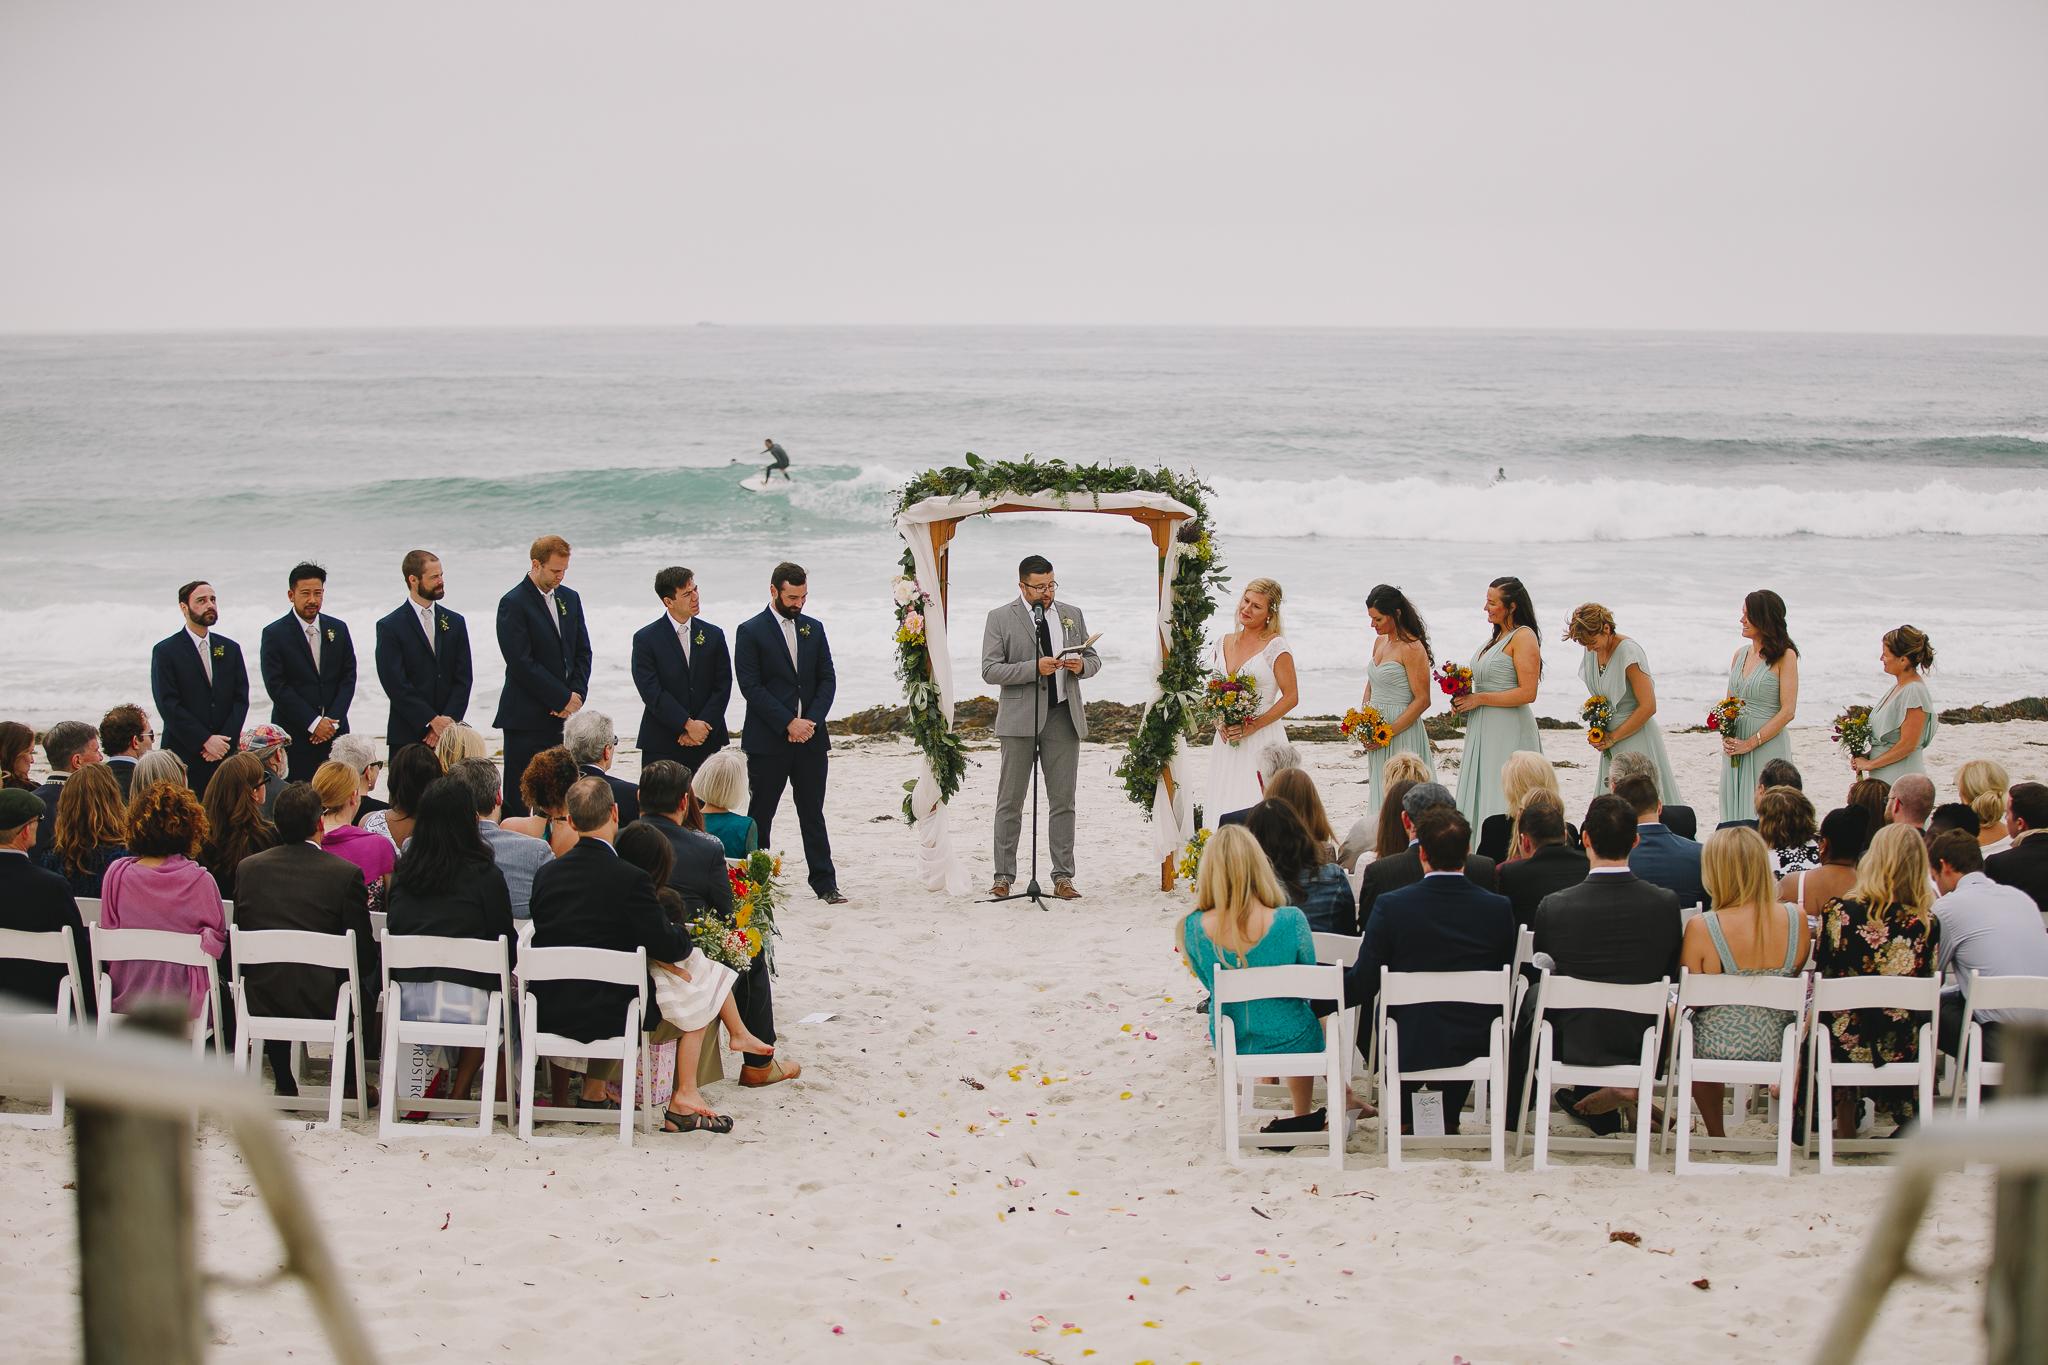 Archer_Inspired_Photography_Pacific_Grove_Ansilomar_Beach_Carmel_Valley_Wedding-87.jpg